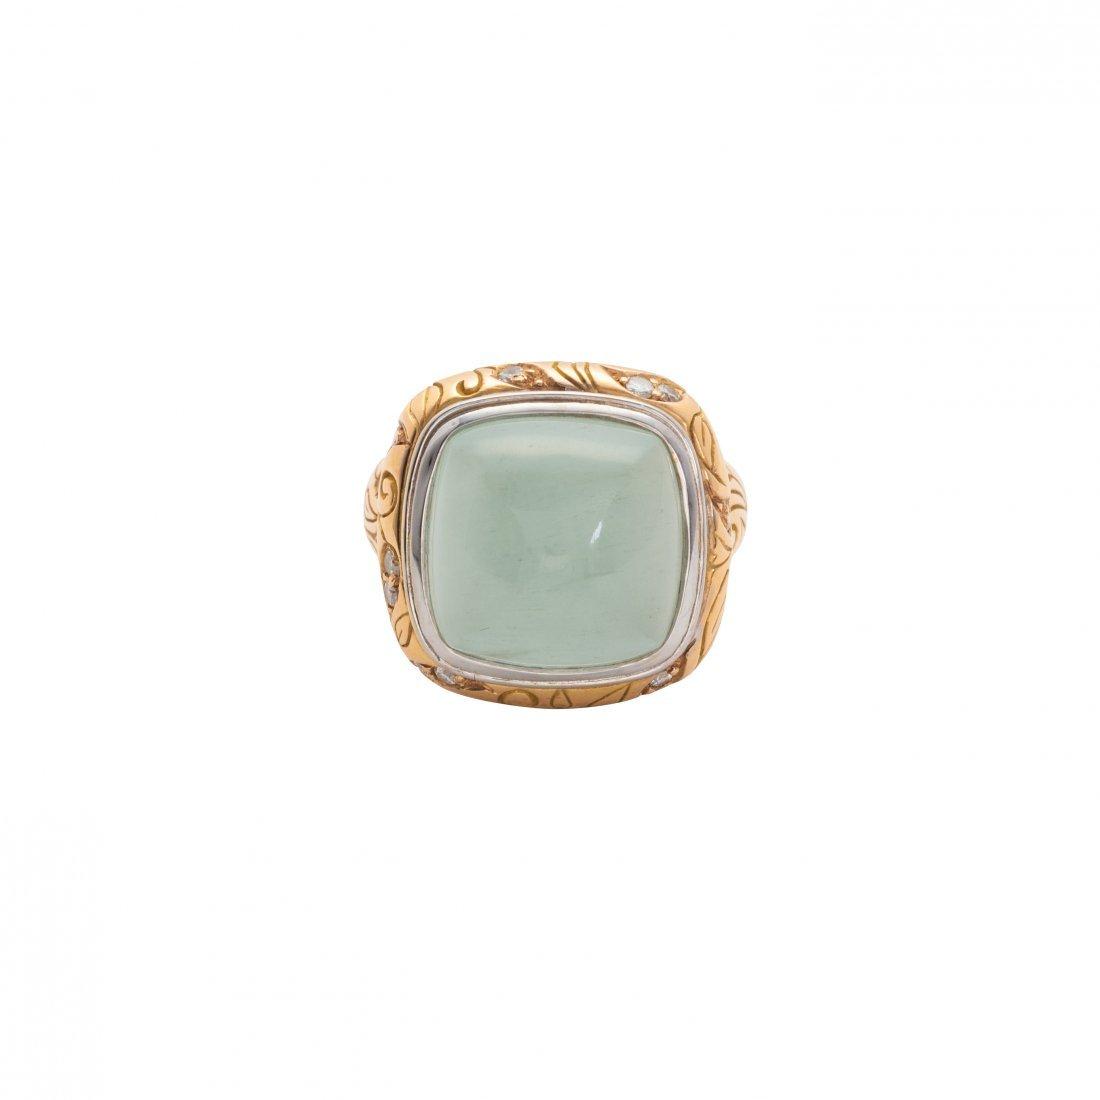 Seiden-Gang, 18 karat Gold and Chalcedony Ring